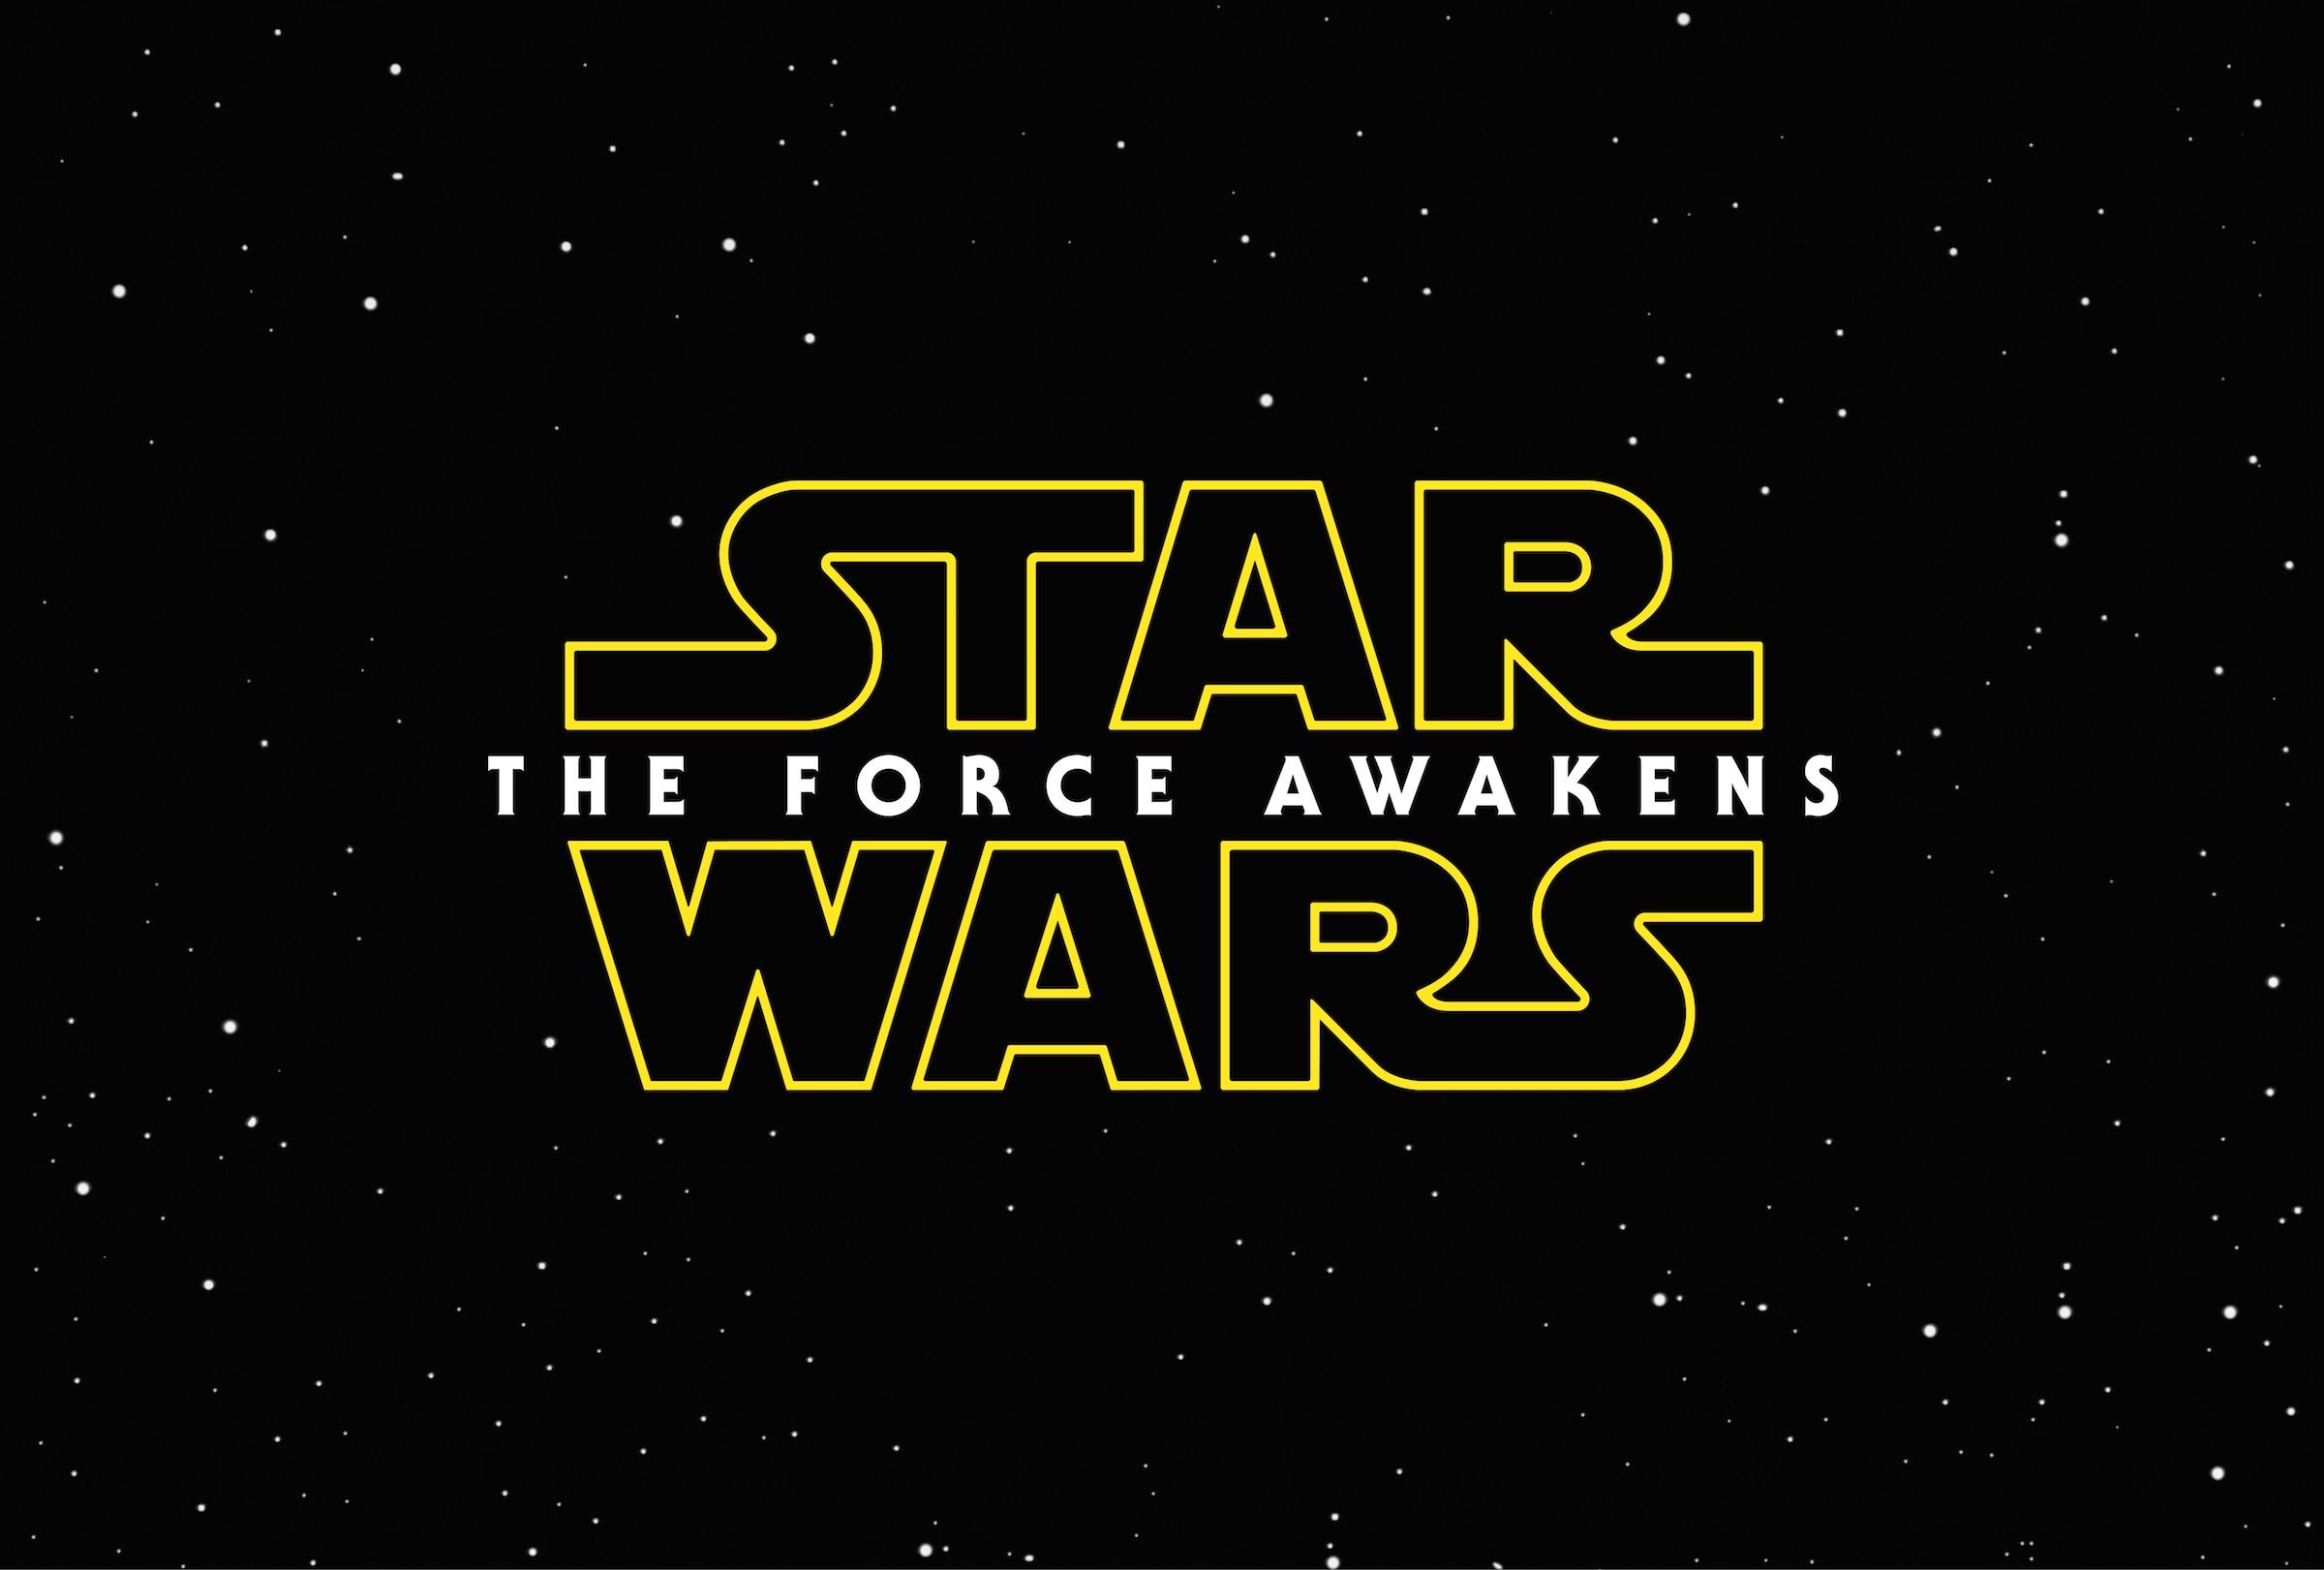 Star Wars The Force Awakens Wallpaper 1 Wallpapersbq